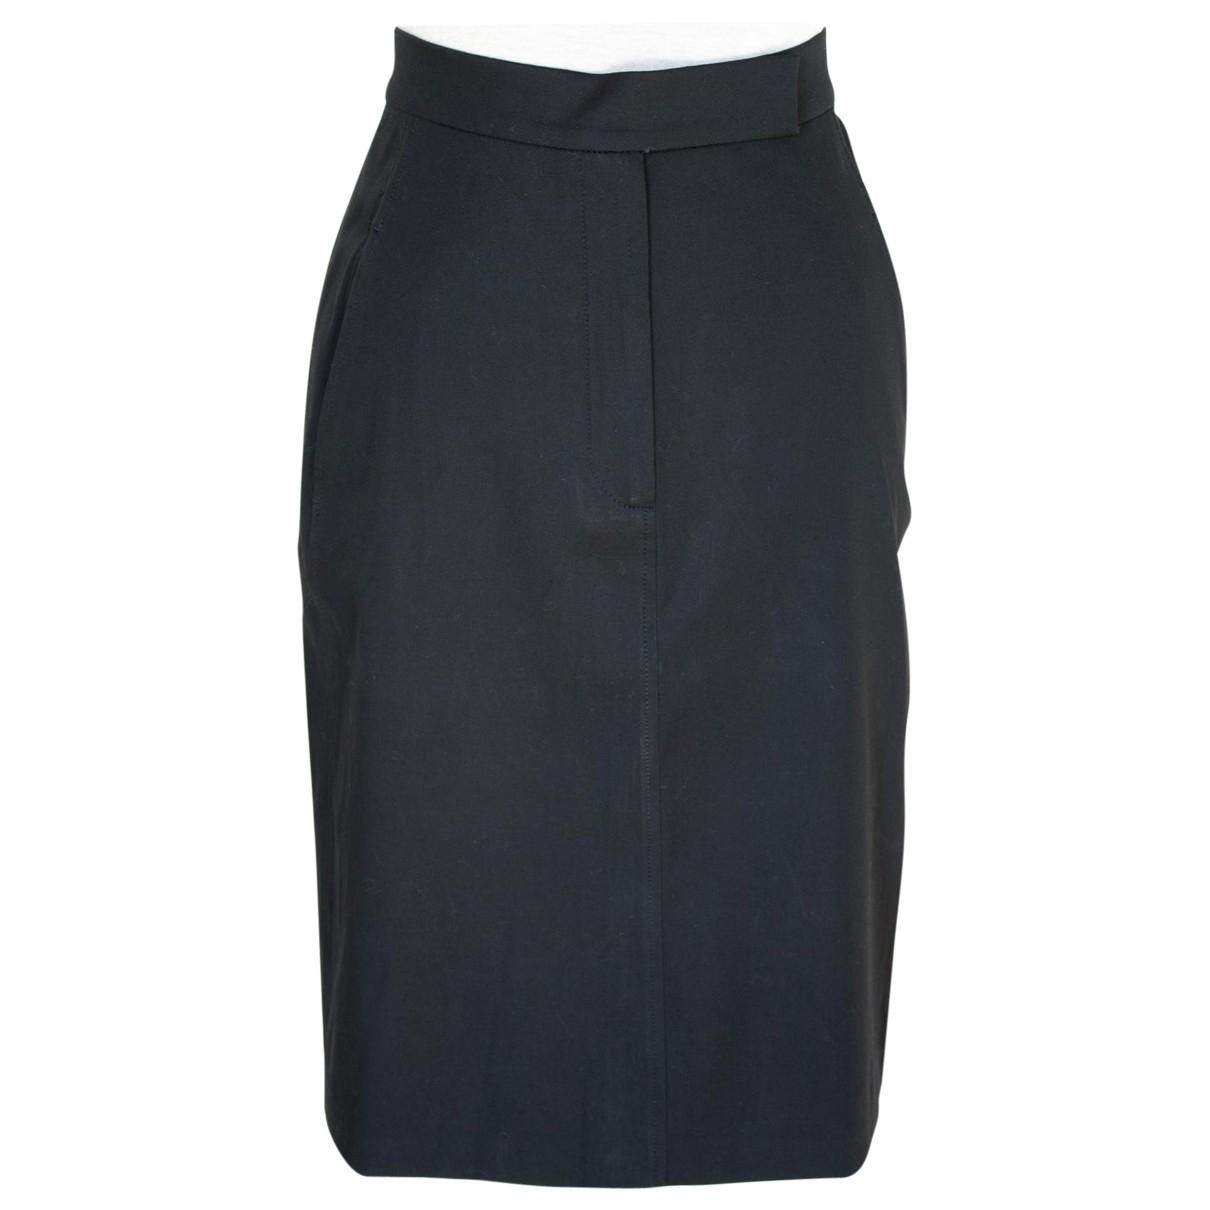 Max Mara \N Black Cotton skirt for Women 42 IT